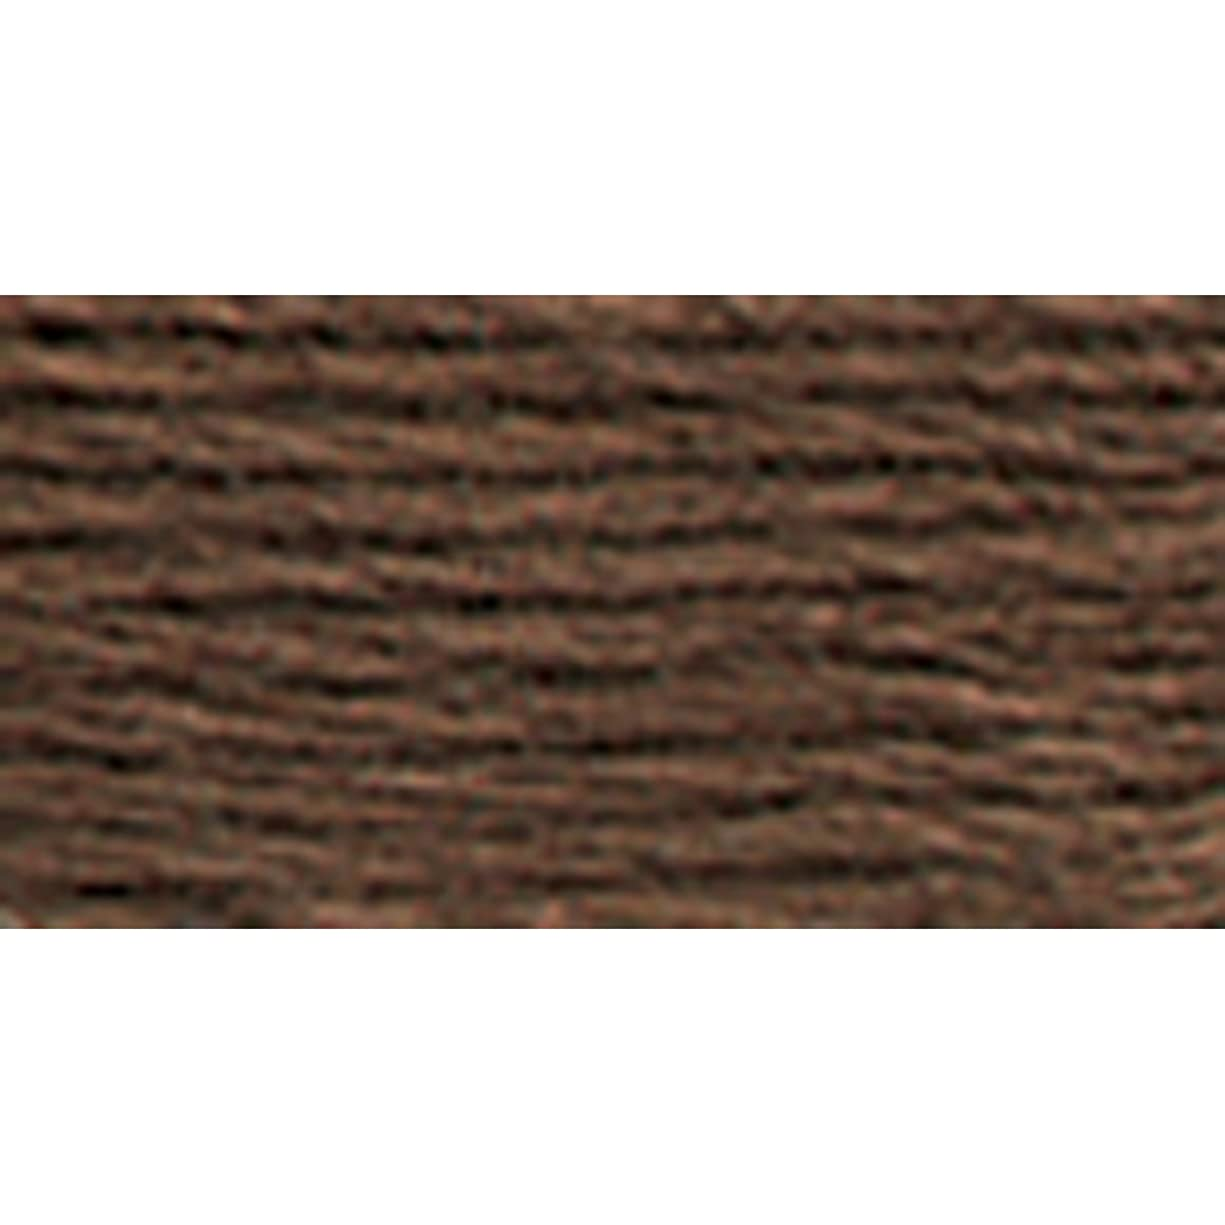 DMC 117-779 Six Strand Embroidery Cotton Floss, Dark Cocoa, 8.7-Yard